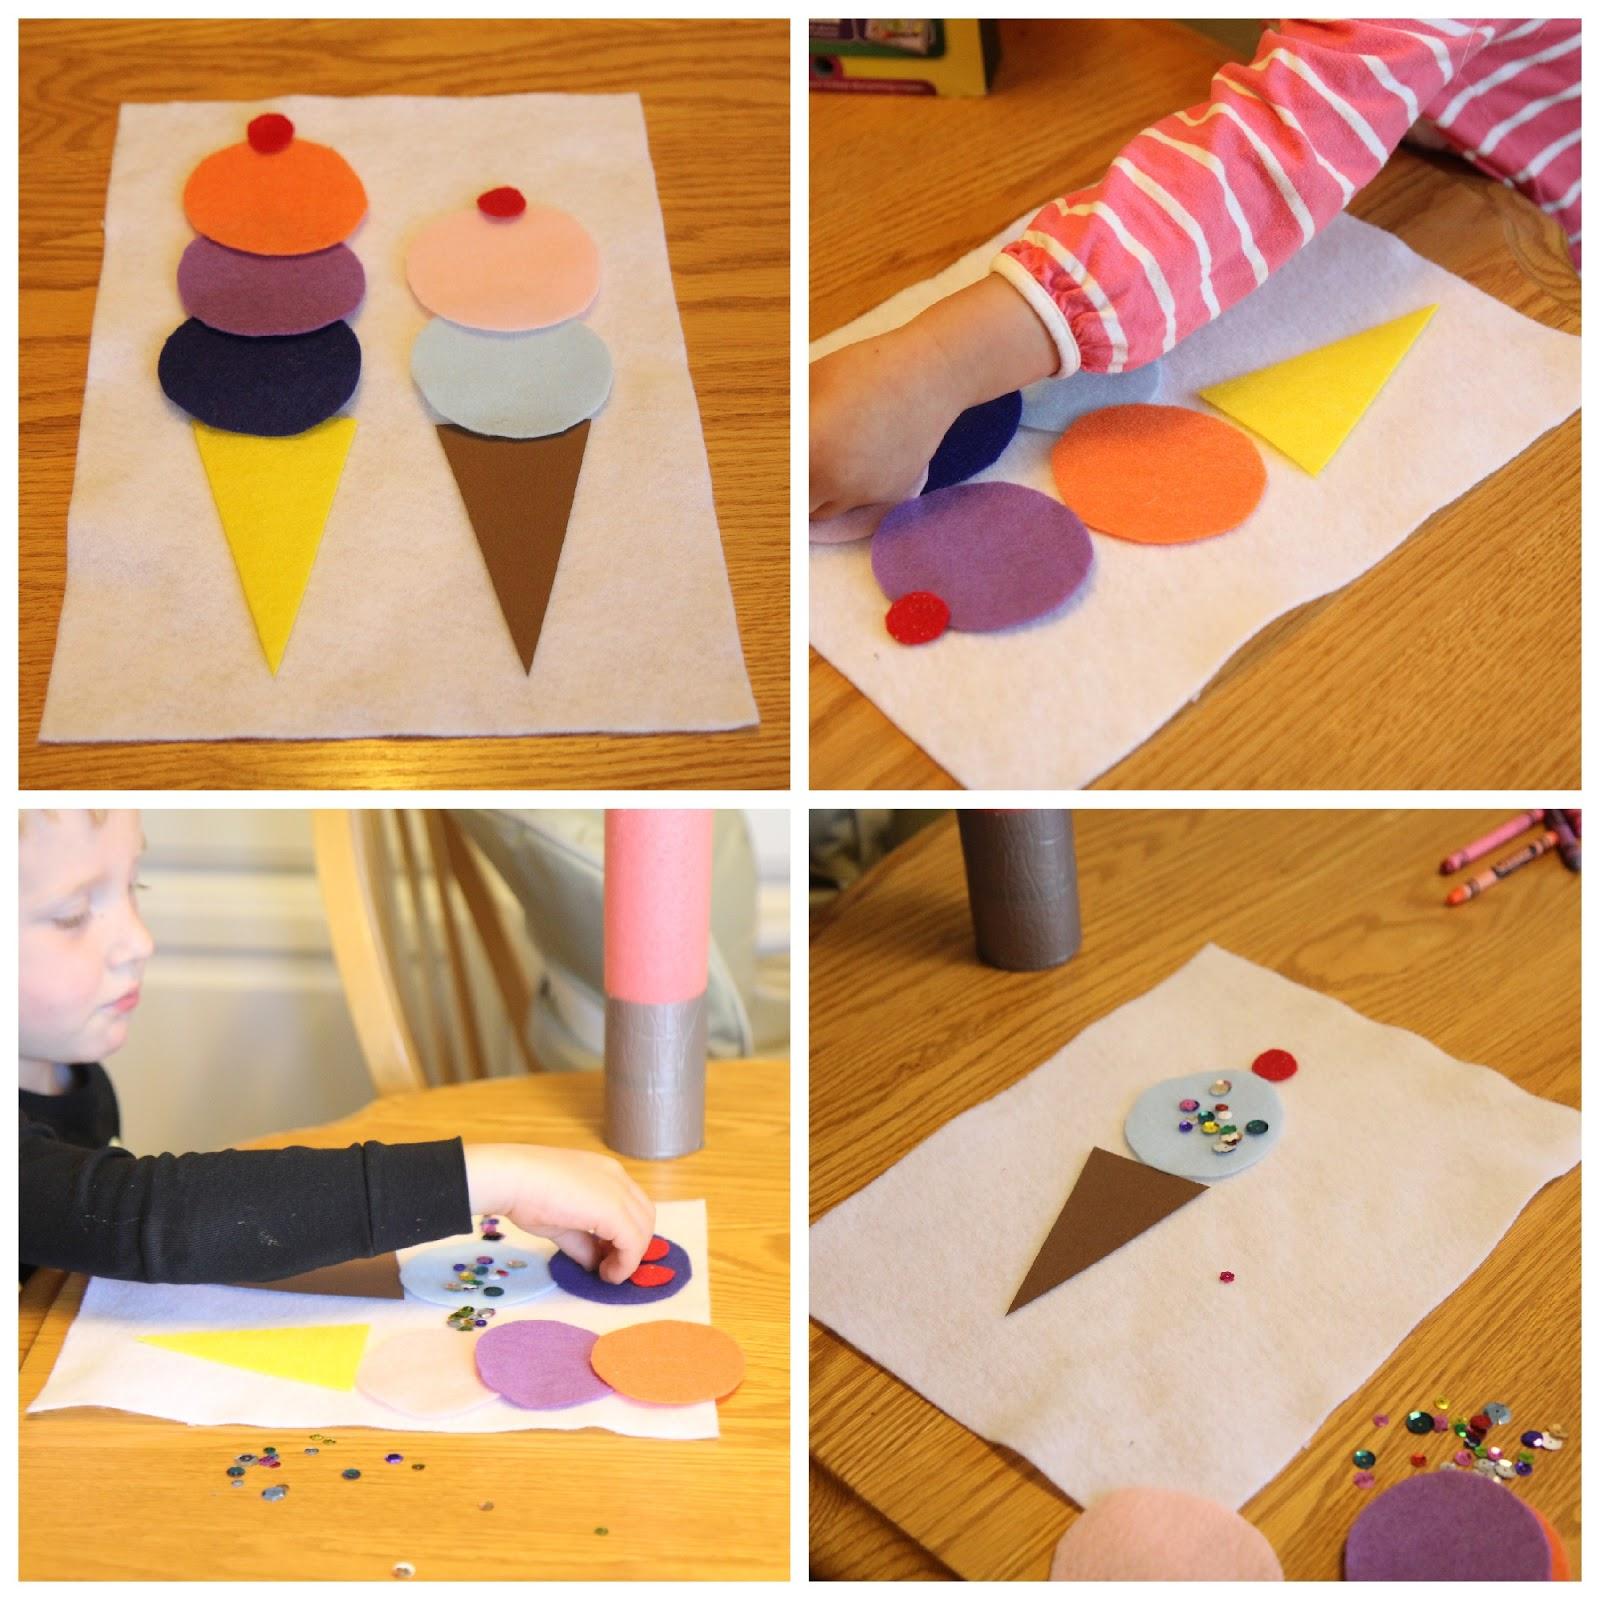 Felt craft book - Craft Book For Kids Felt Craft Book Craft Book For Kids Toddler Craft Book 3